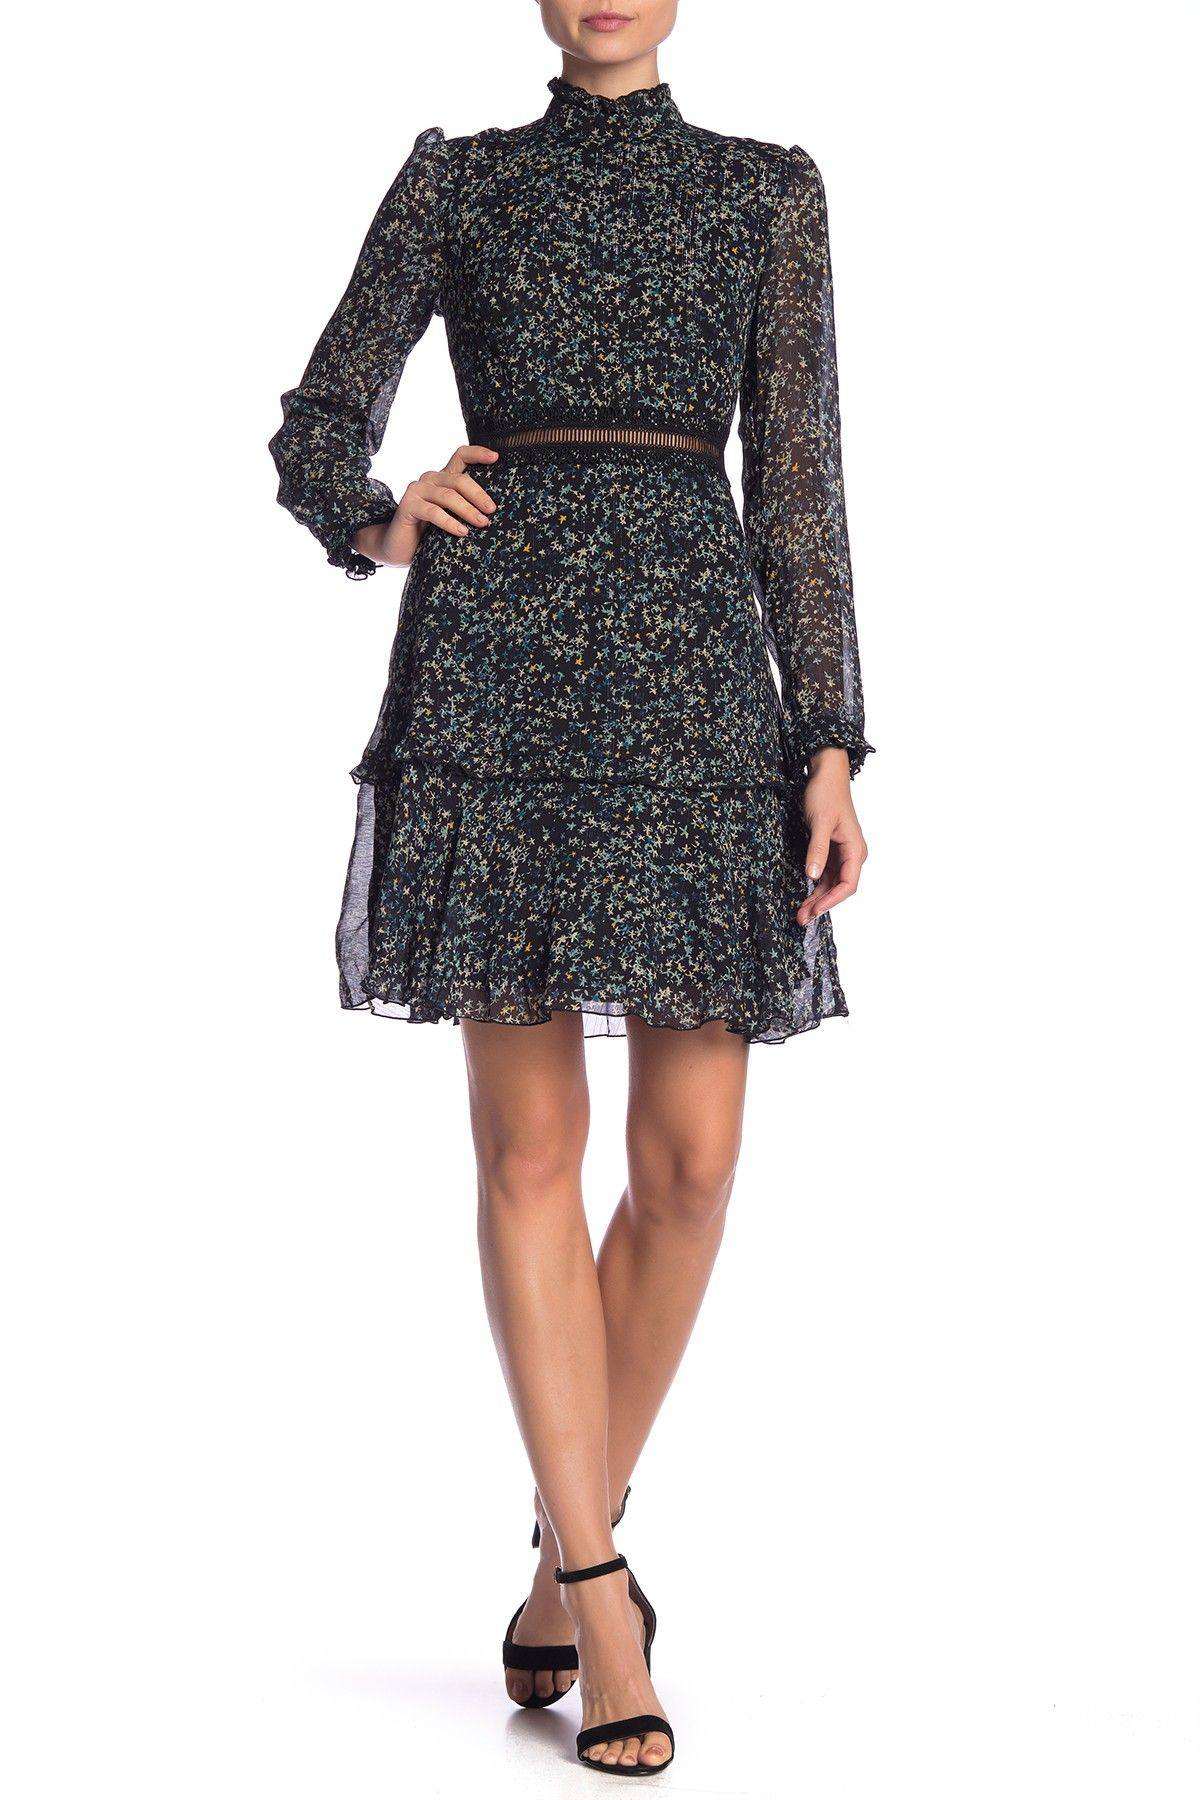 428fb1199b3 Crinkle Long Sleeve Print Dress by Donna Morgan on  HauteLook